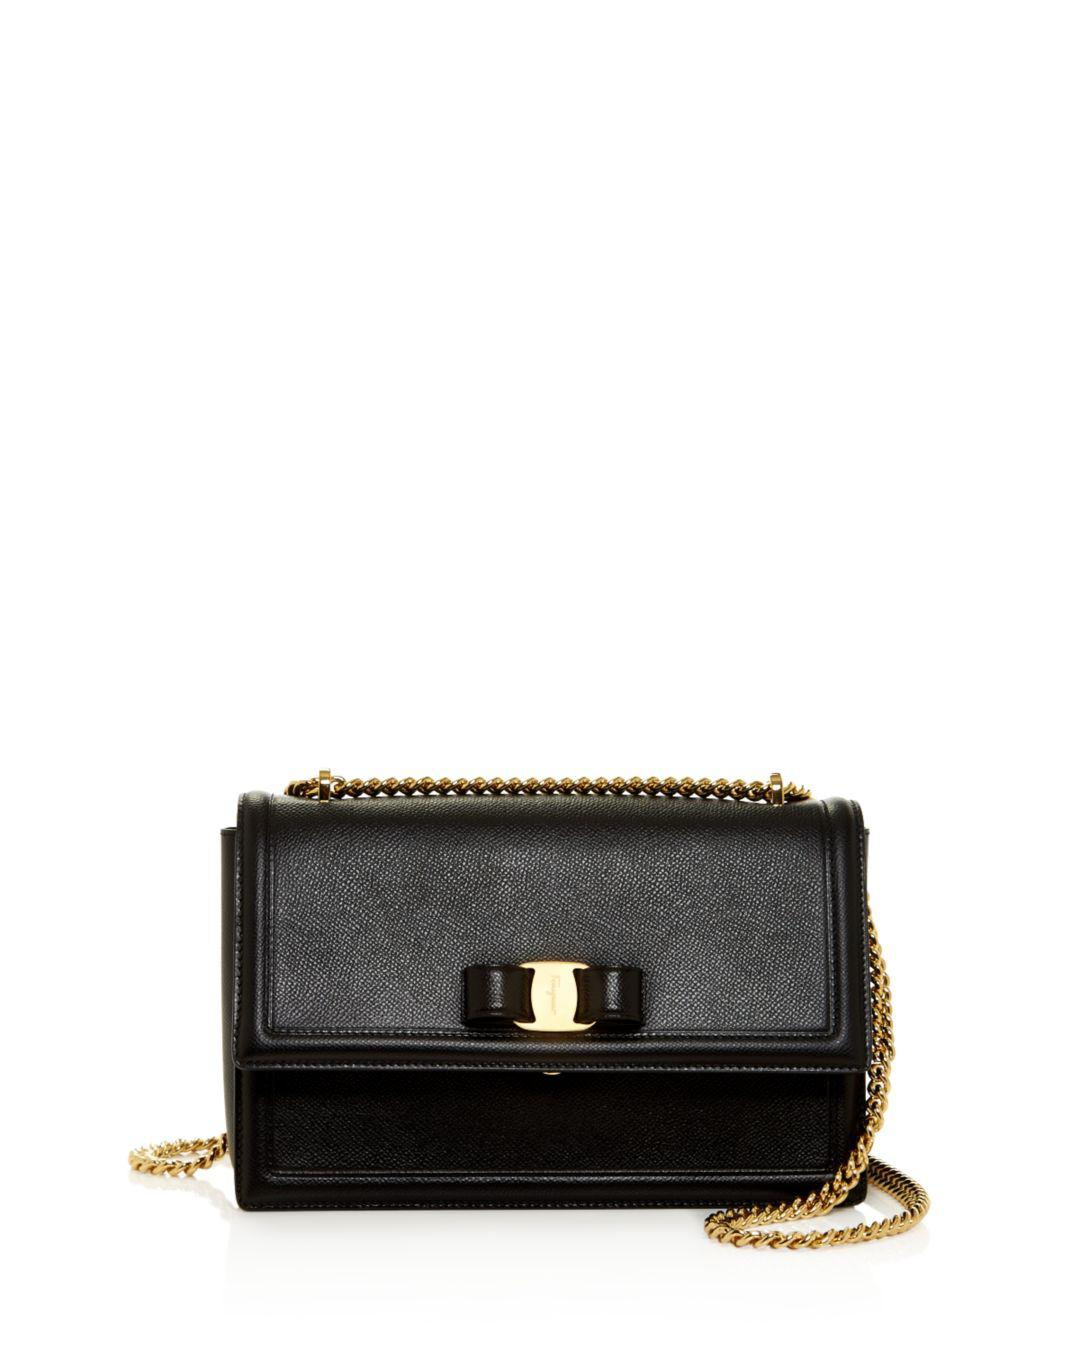 59953cbe0df Ferragamo. Women s Black Medium Ginny Calfskin Shoulder Bag.  1,250 From  Bloomingdale s